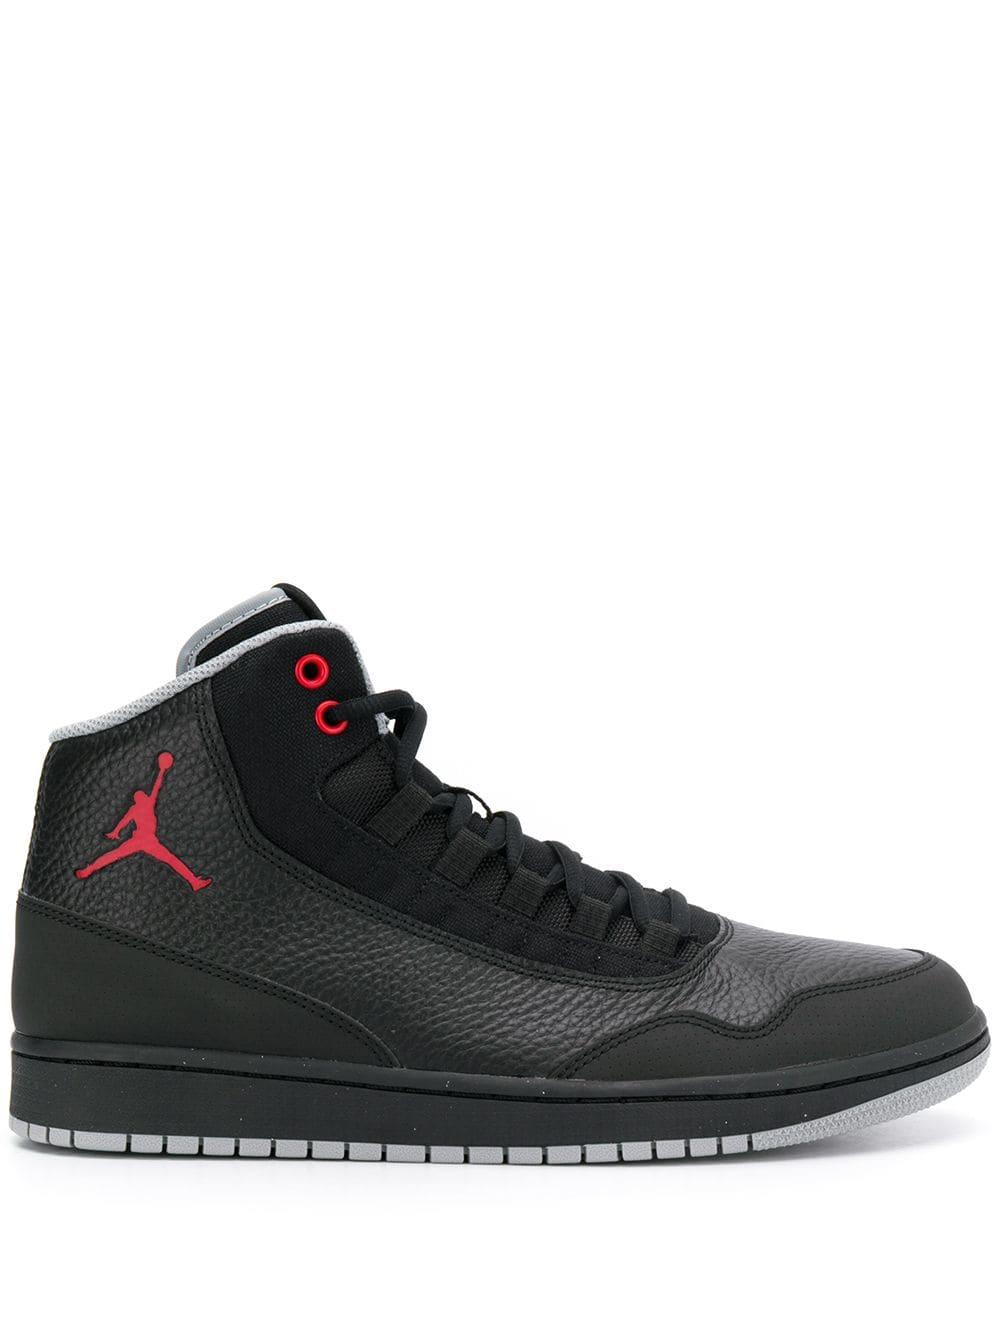 Grave crisantemo Perth  Nike Jordan Executive Sneakers - Black   ModeSens   Nike jordan, Sneakers,  Sneakers black